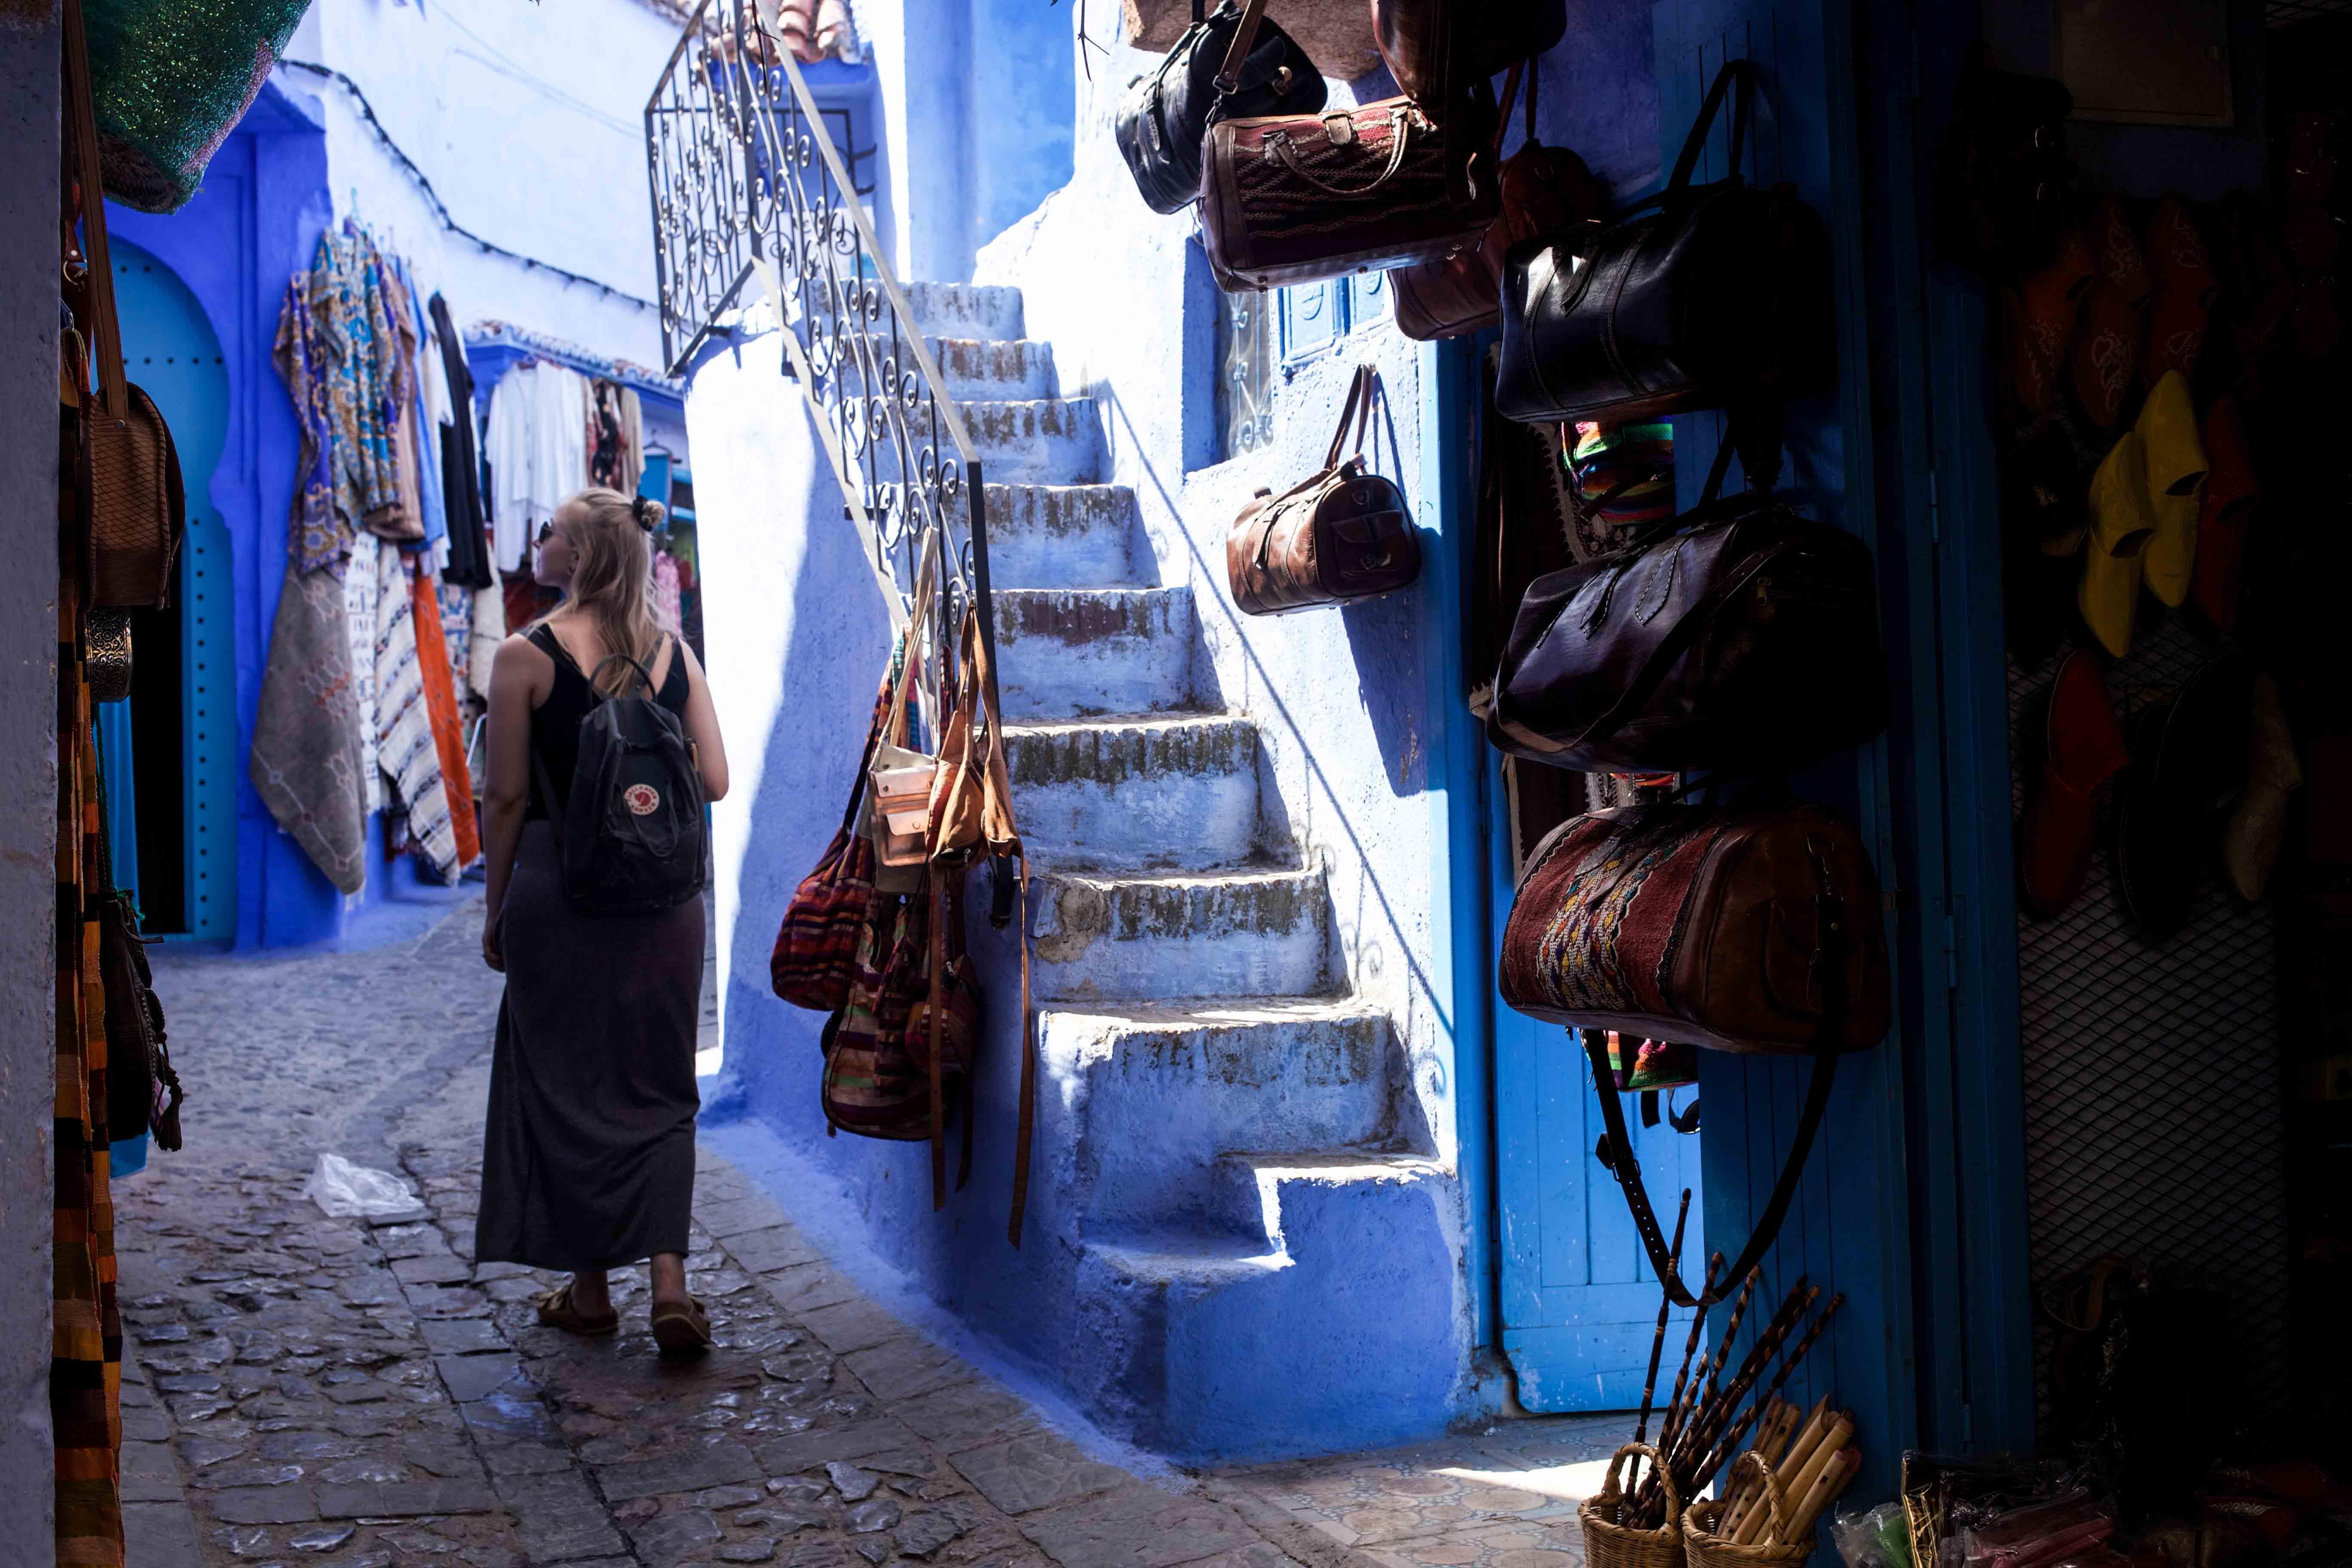 bus-tour-spanien-marokko-gibraltar-reiseblog-travelblog-reiseübelkeit-tipps-road-trip_8015